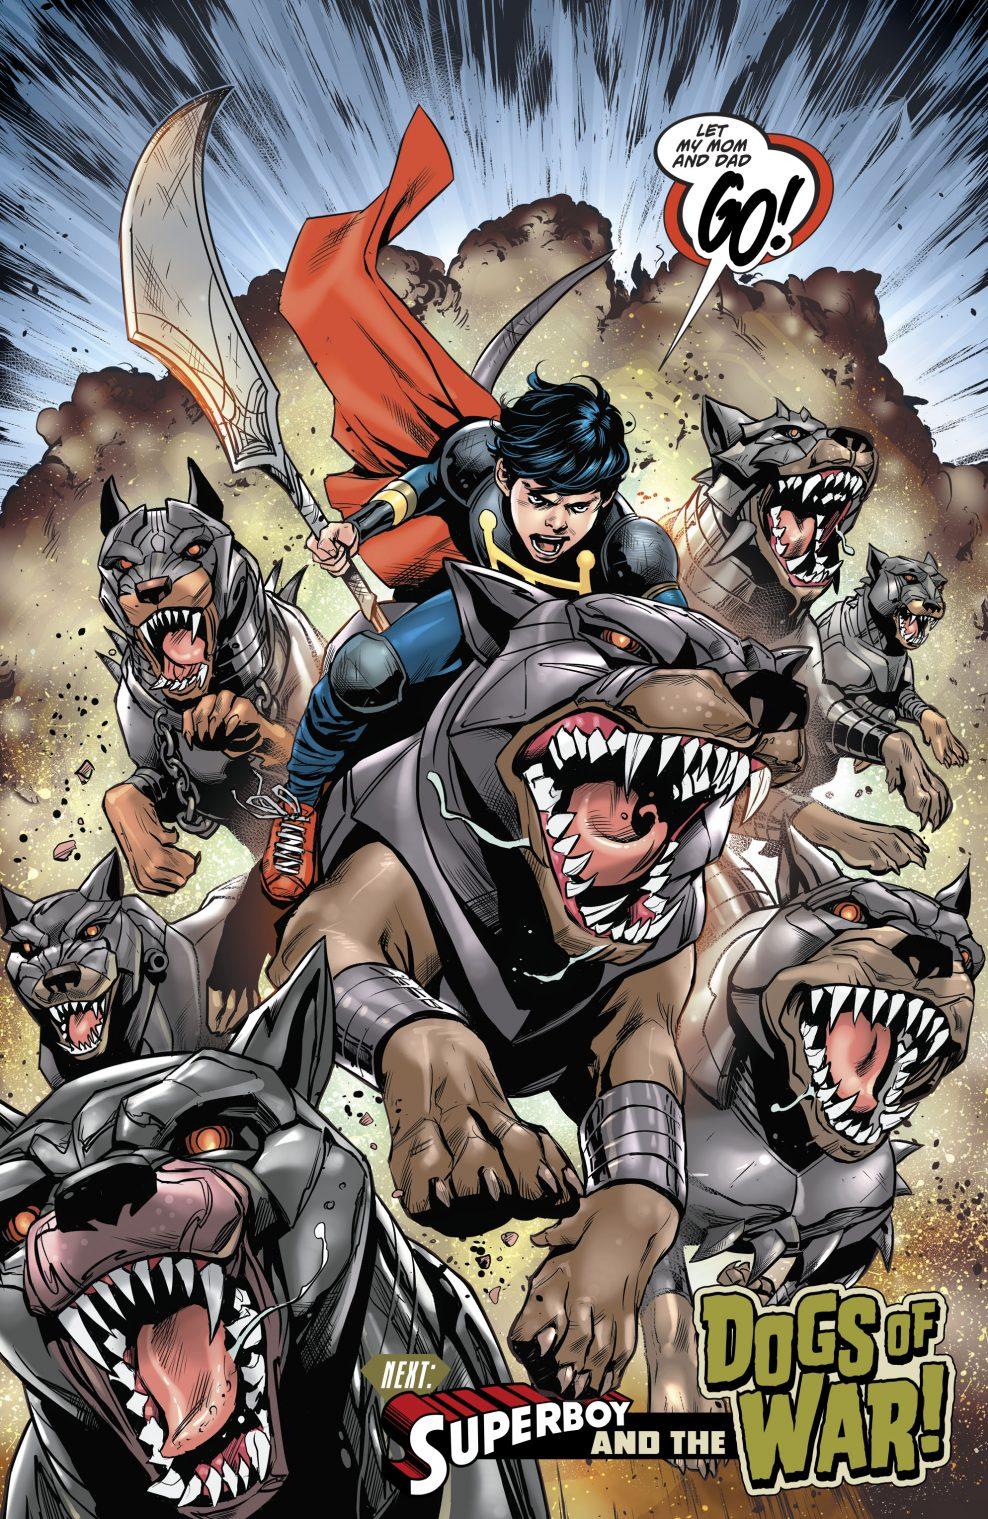 Superboy (Superman Vol 4 #35)